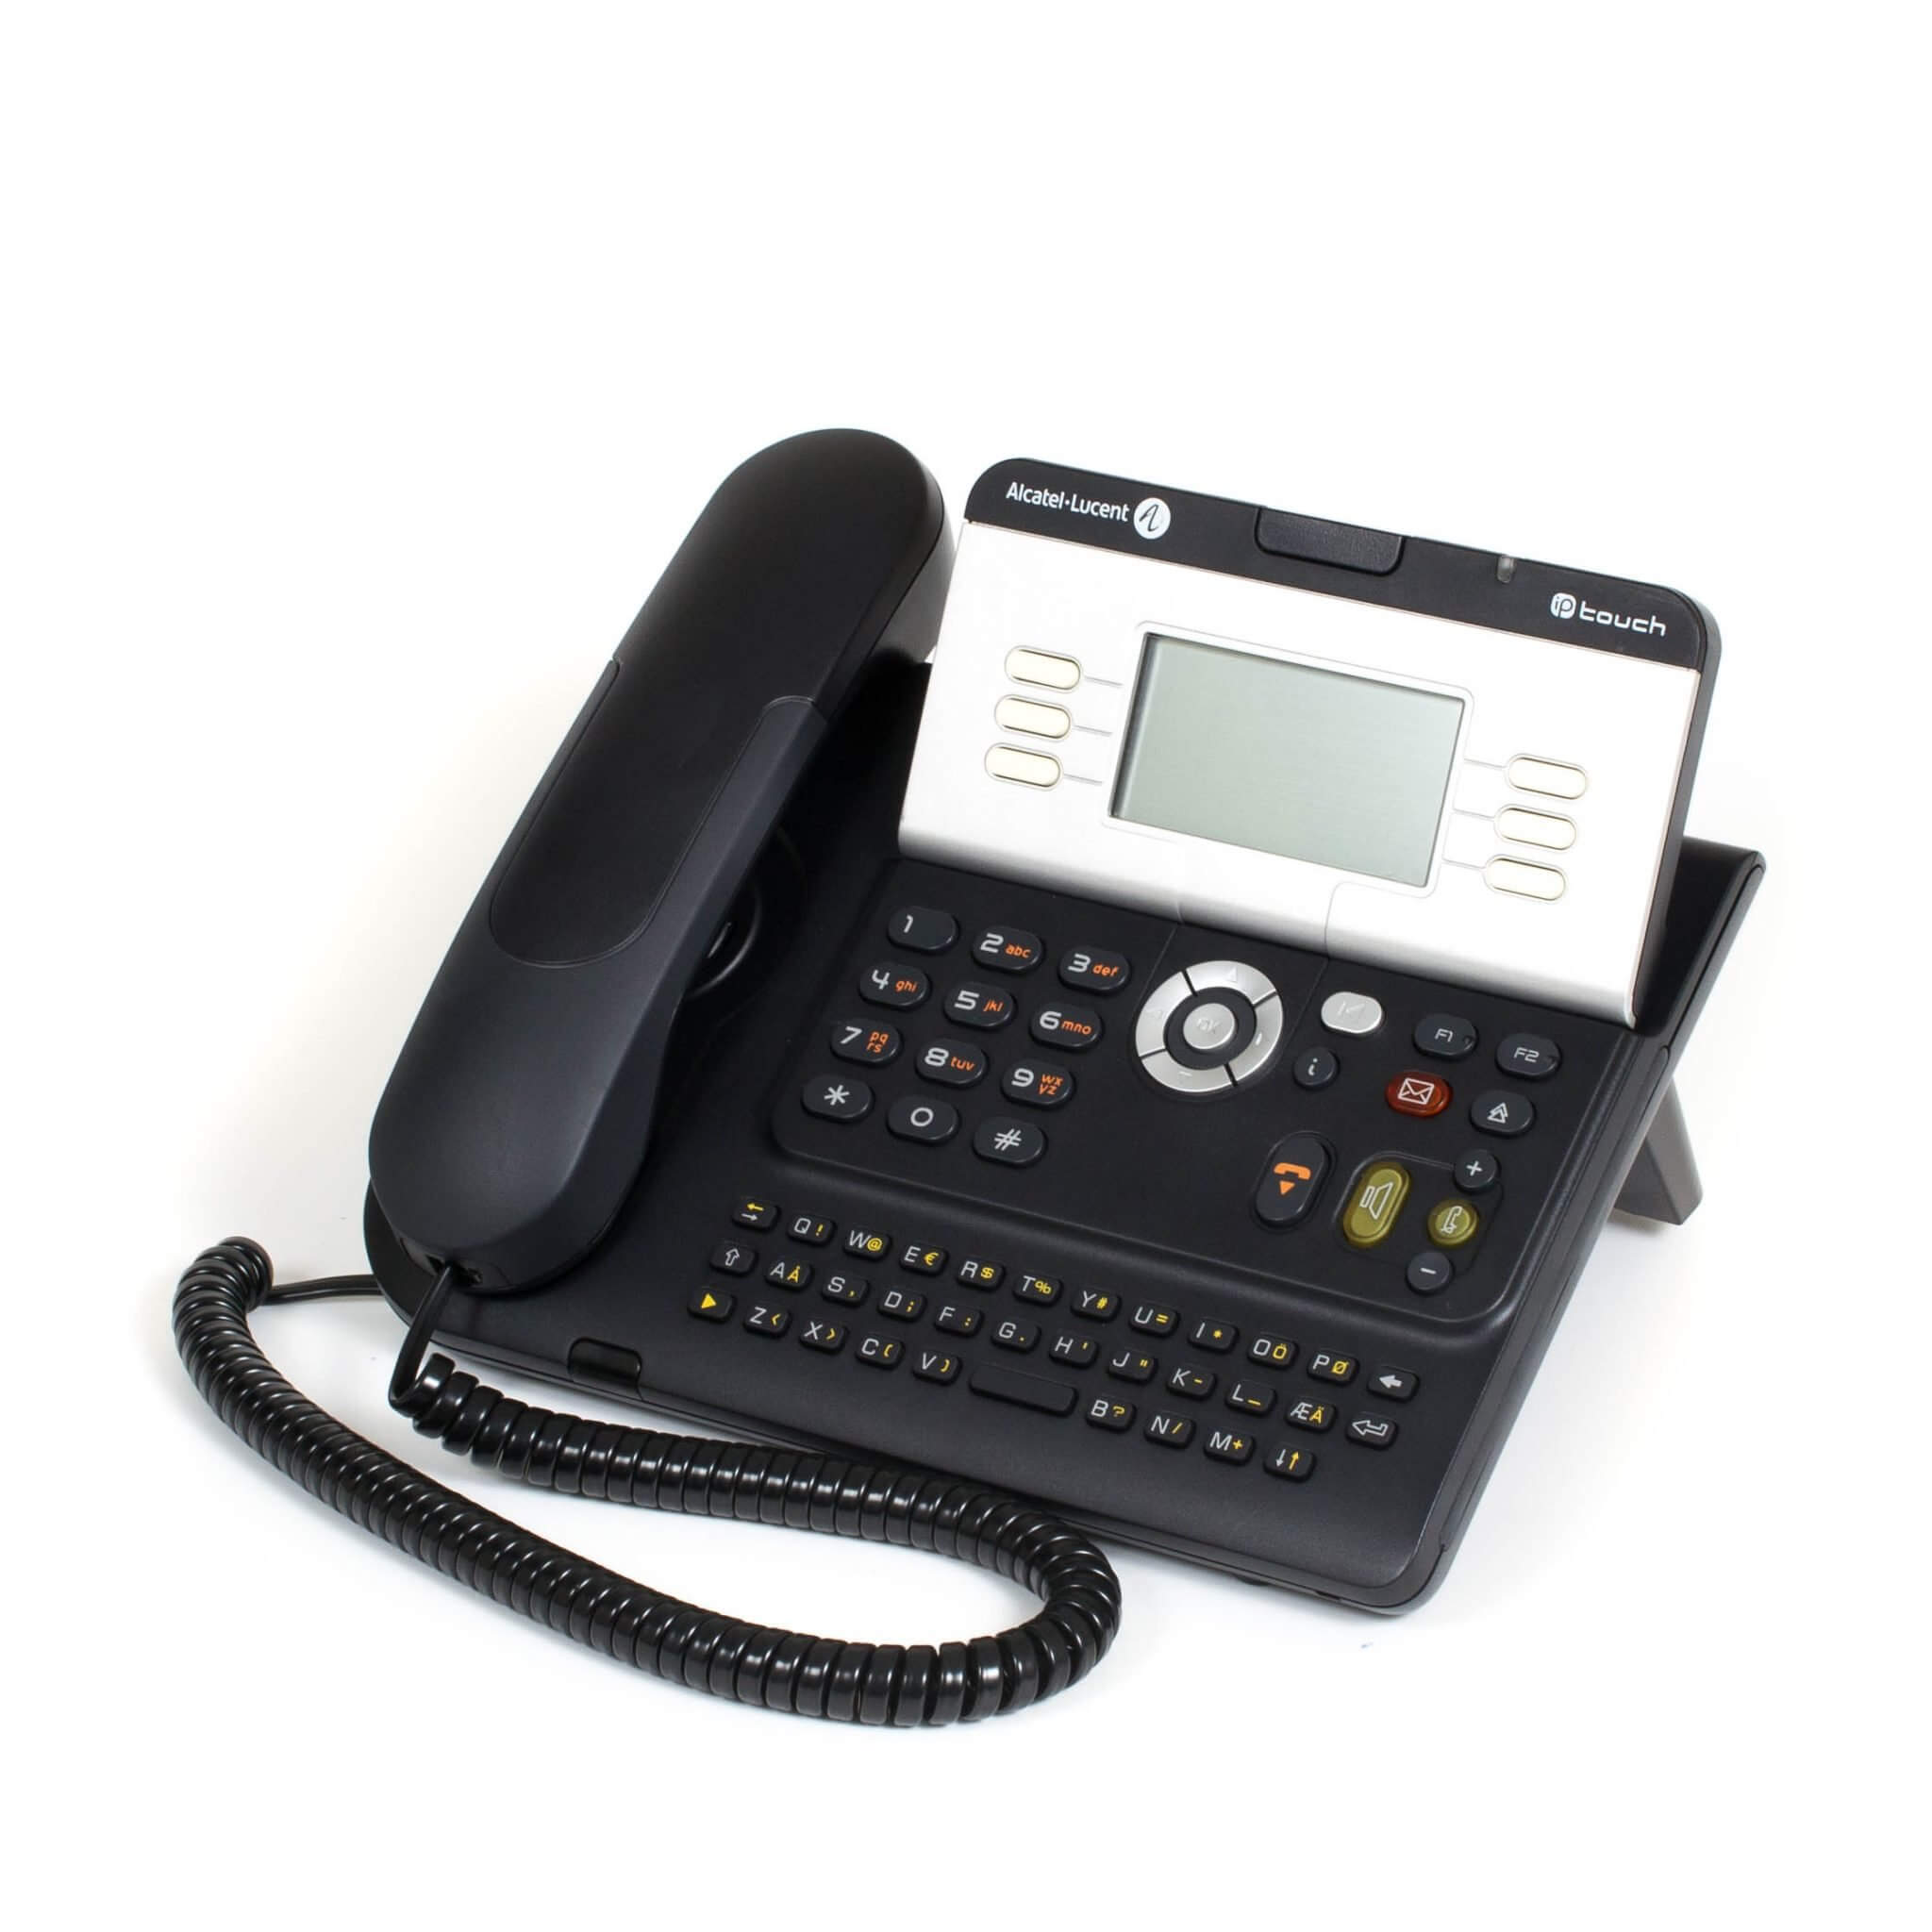 Alcatel Lucent Phone Manual 4019